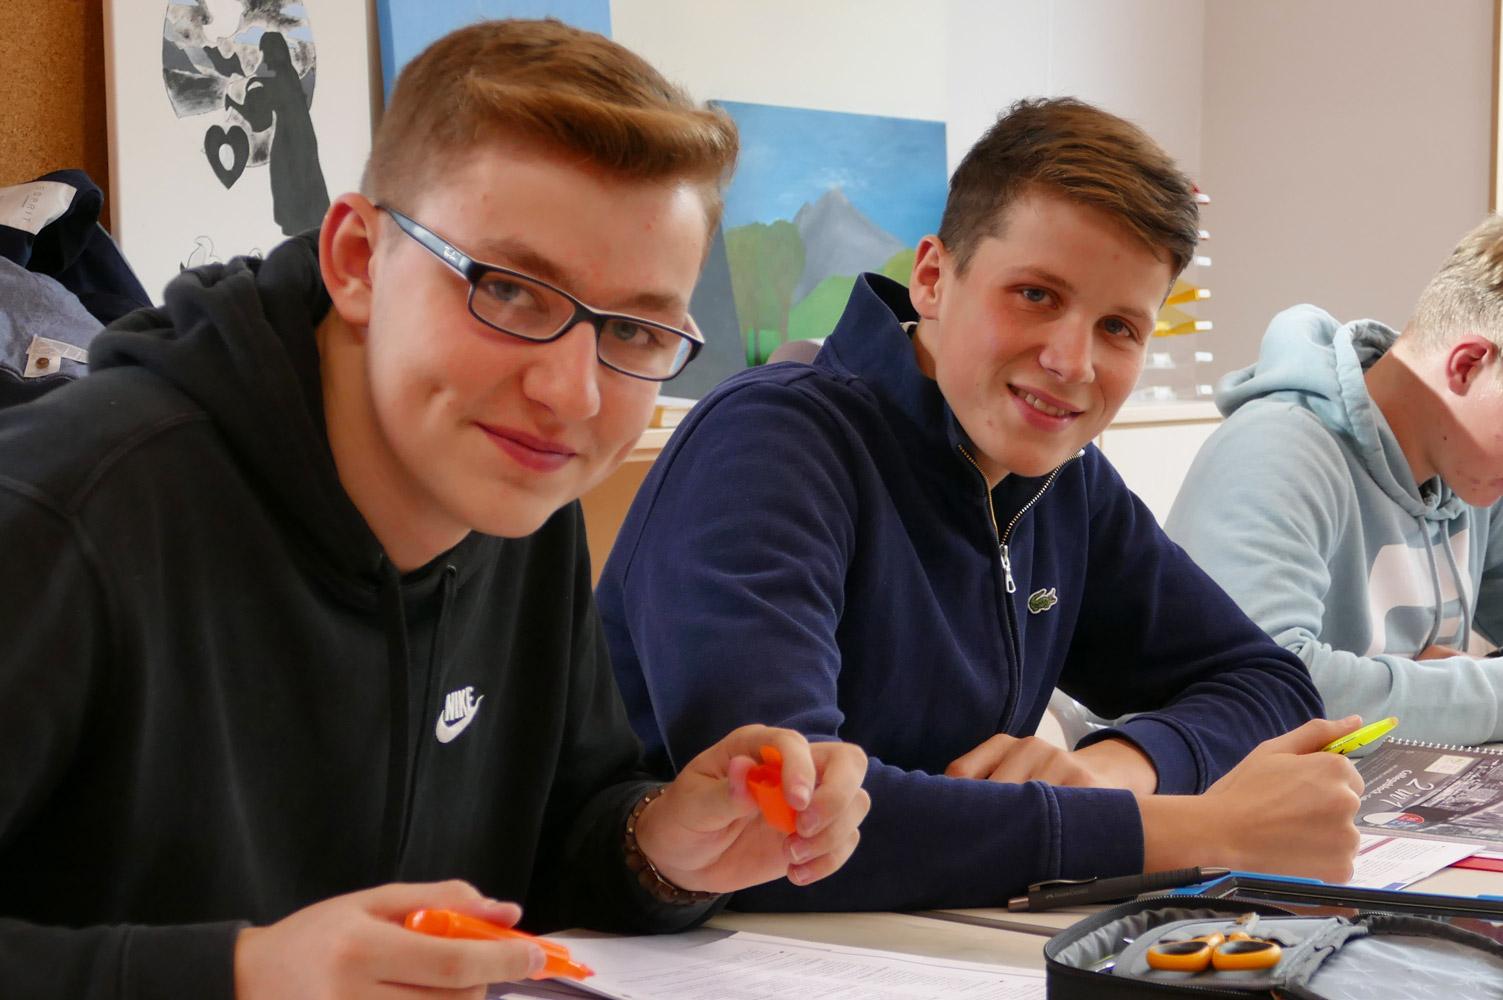 Oberstufenschüler im Deutschunterricht